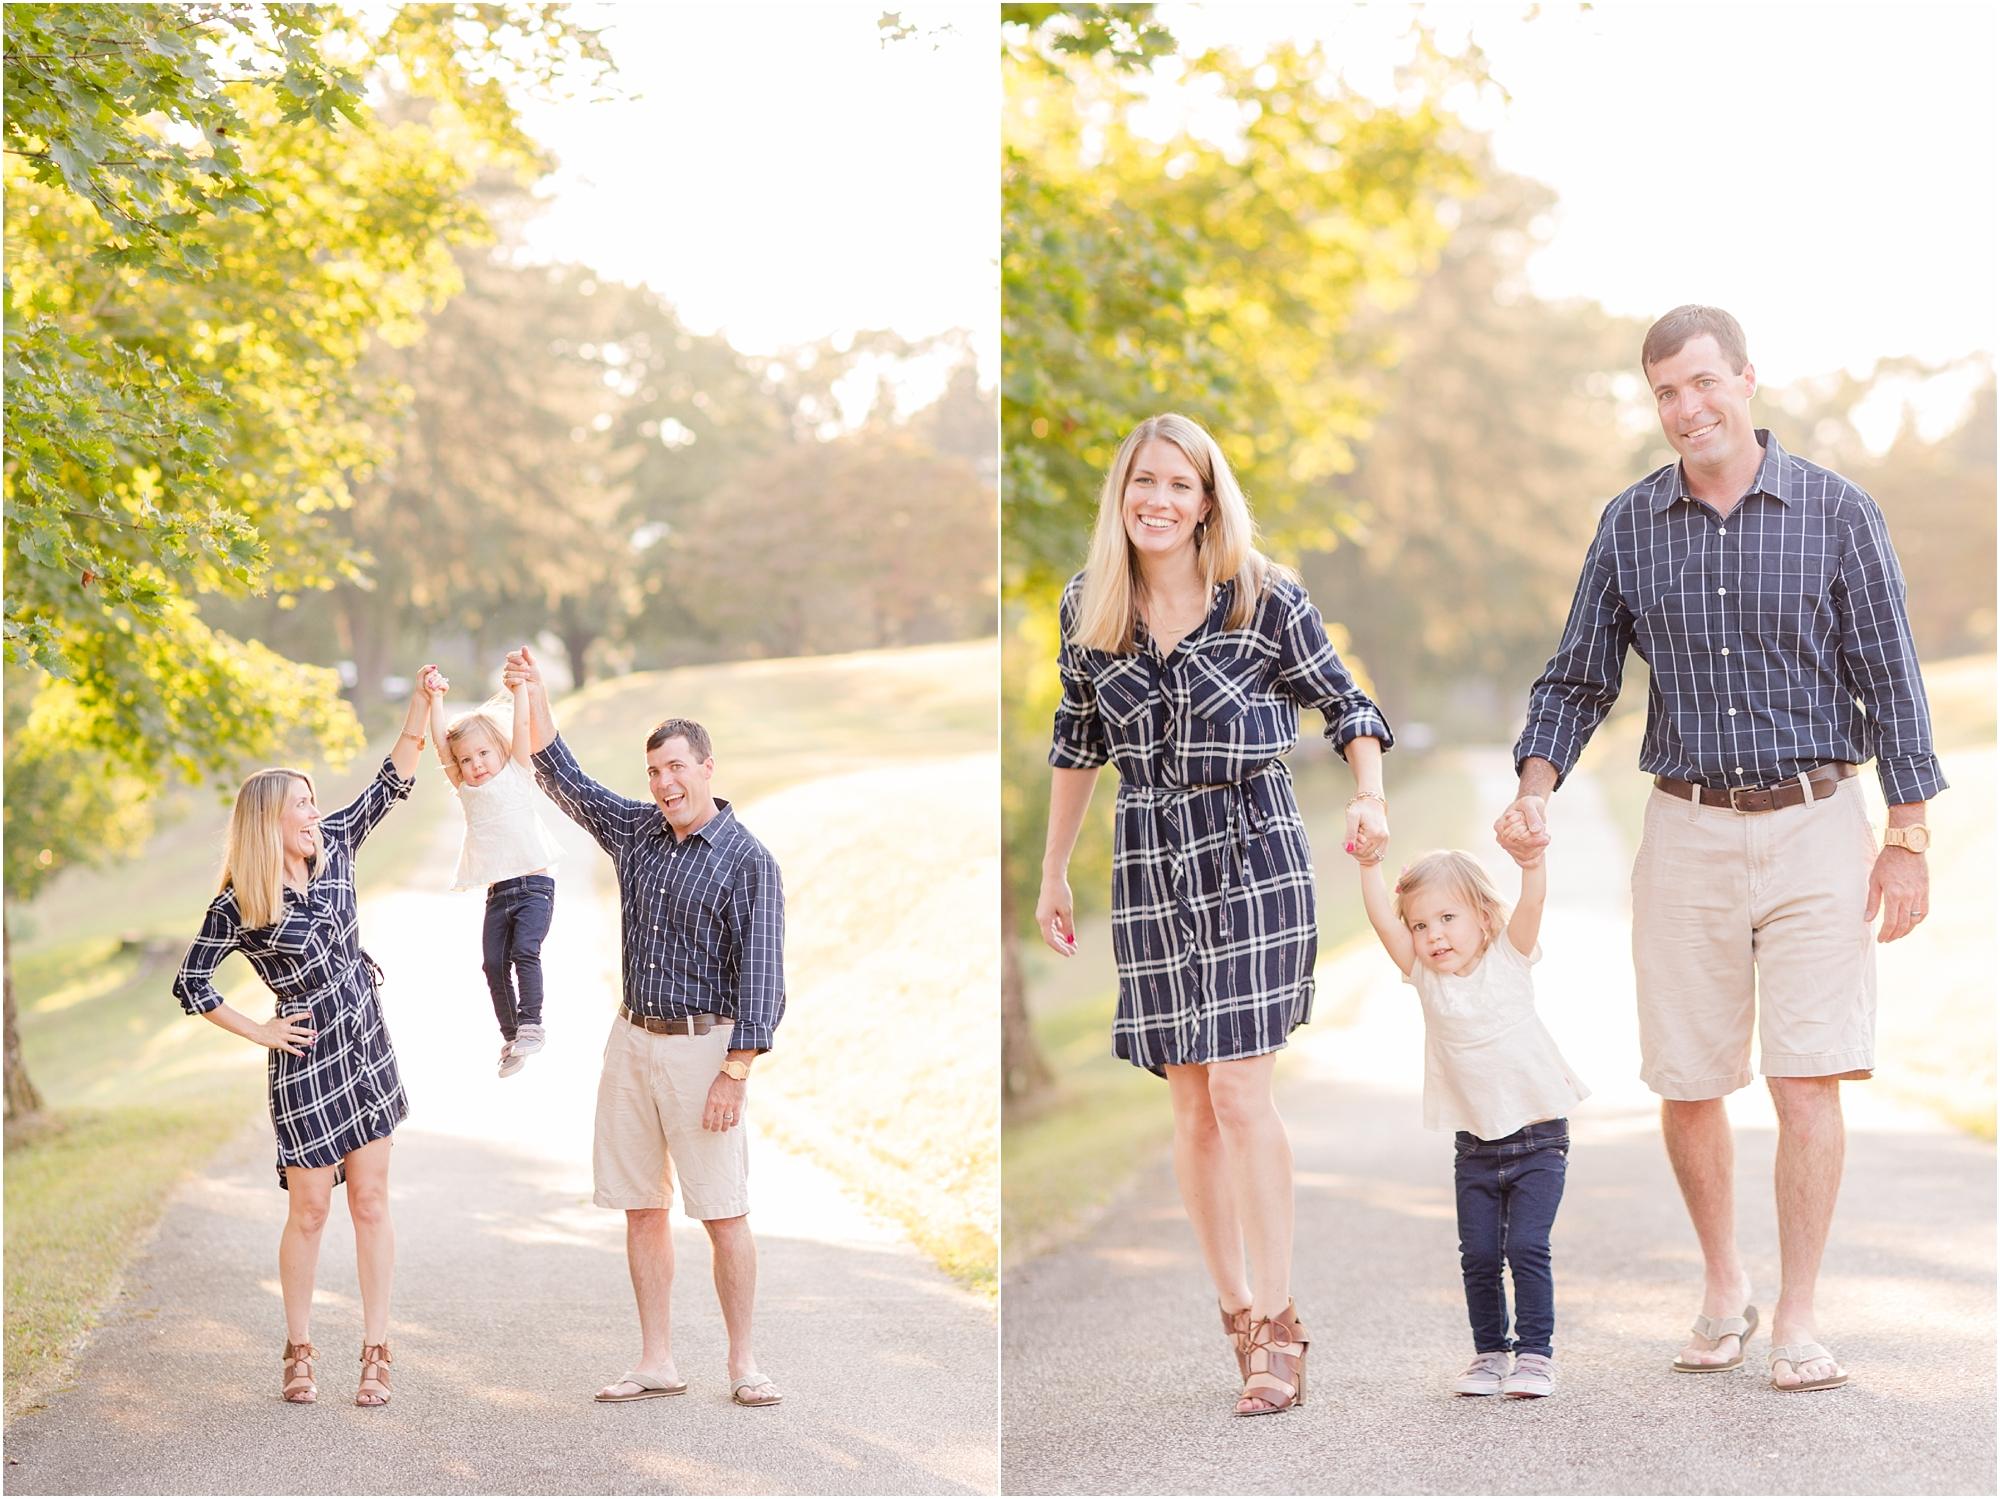 Ryan Family 2016-66_anna grace photography baltimore maryland family photographer photo.jpg